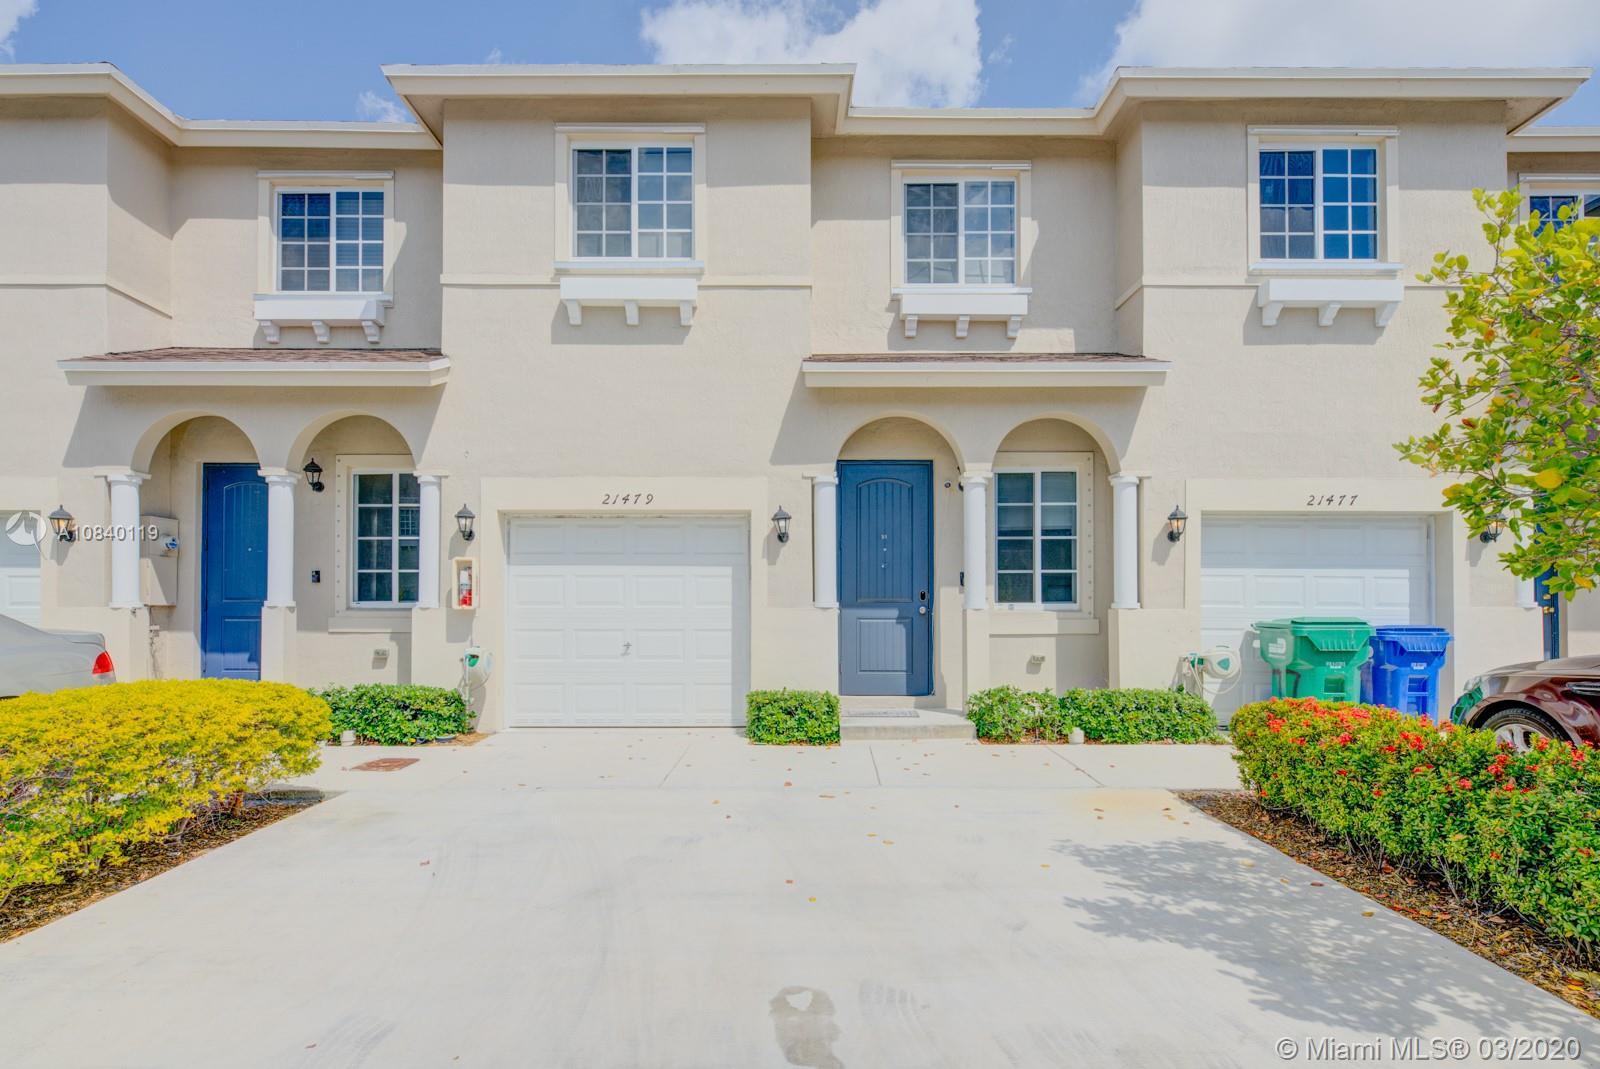 21479 NW 14th Ct, Miami Gardens, FL 33169 - Miami Gardens, FL real estate listing